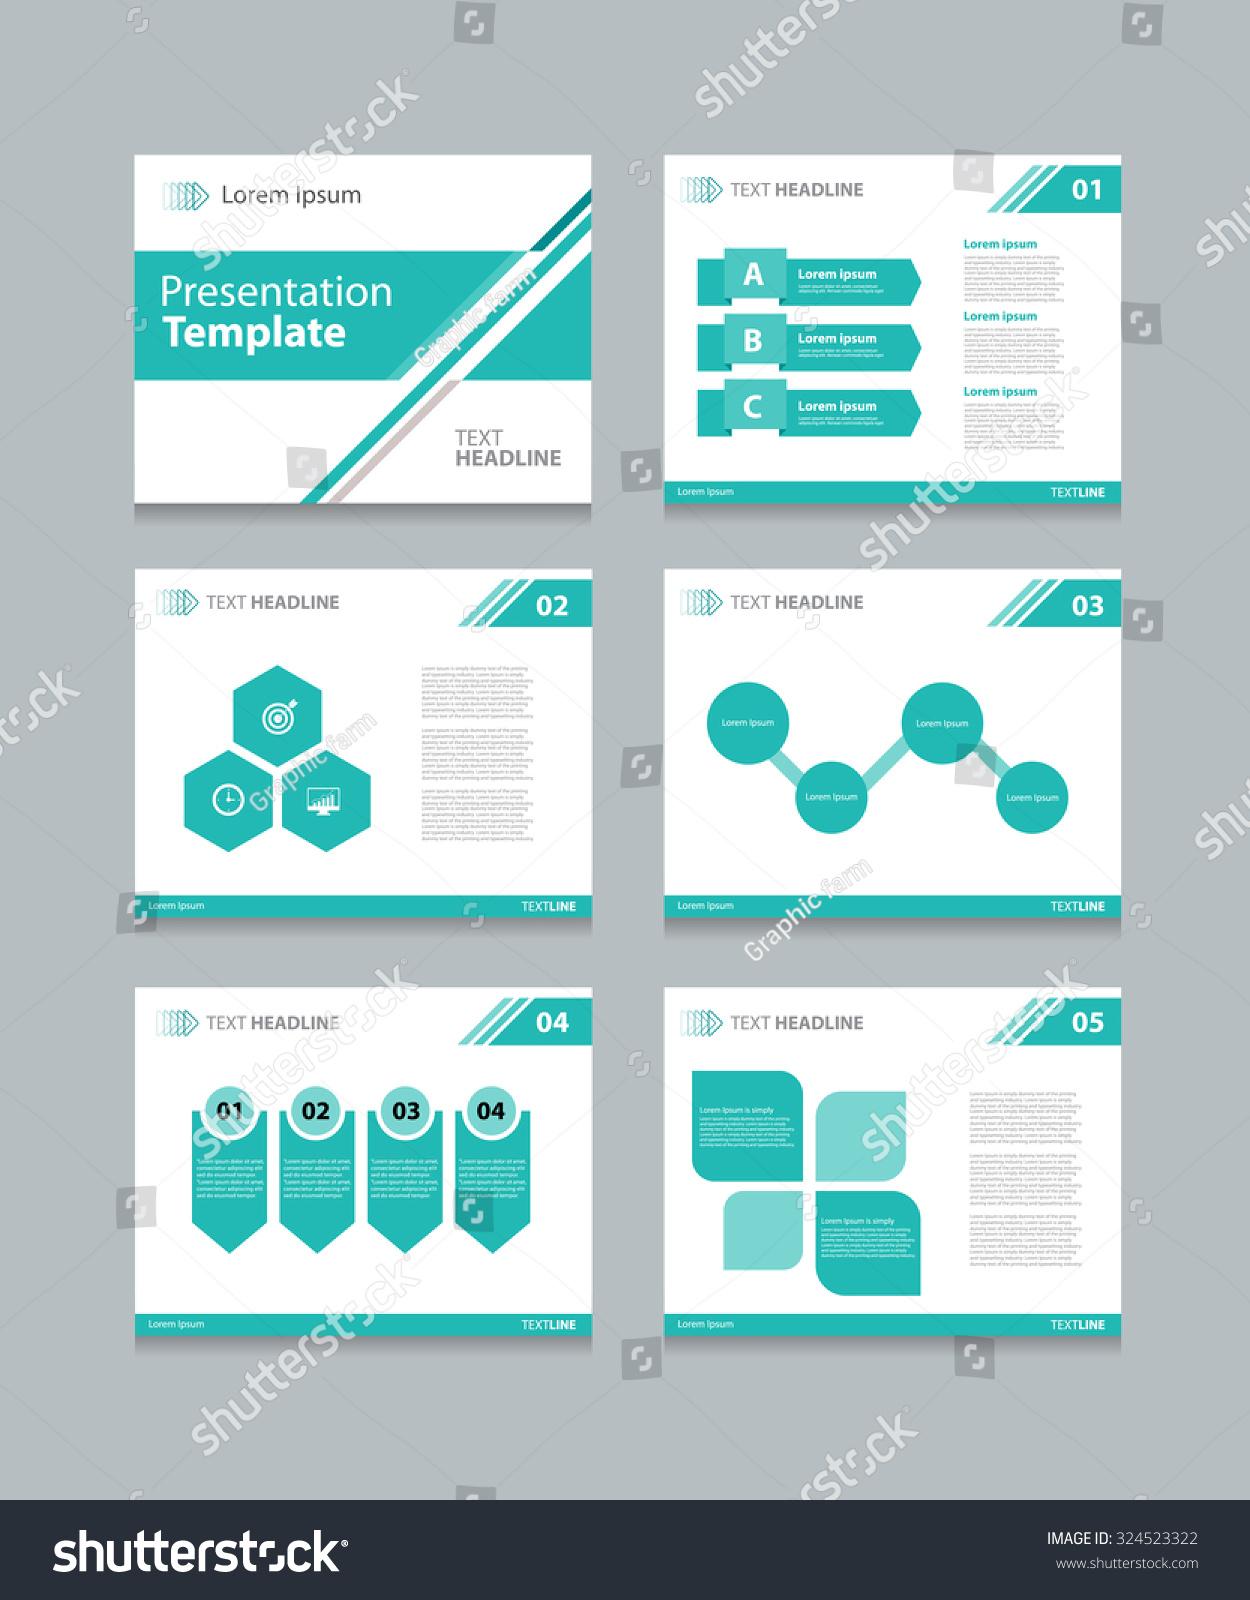 Effective Customer Service - PowerPoint PPT Presentation